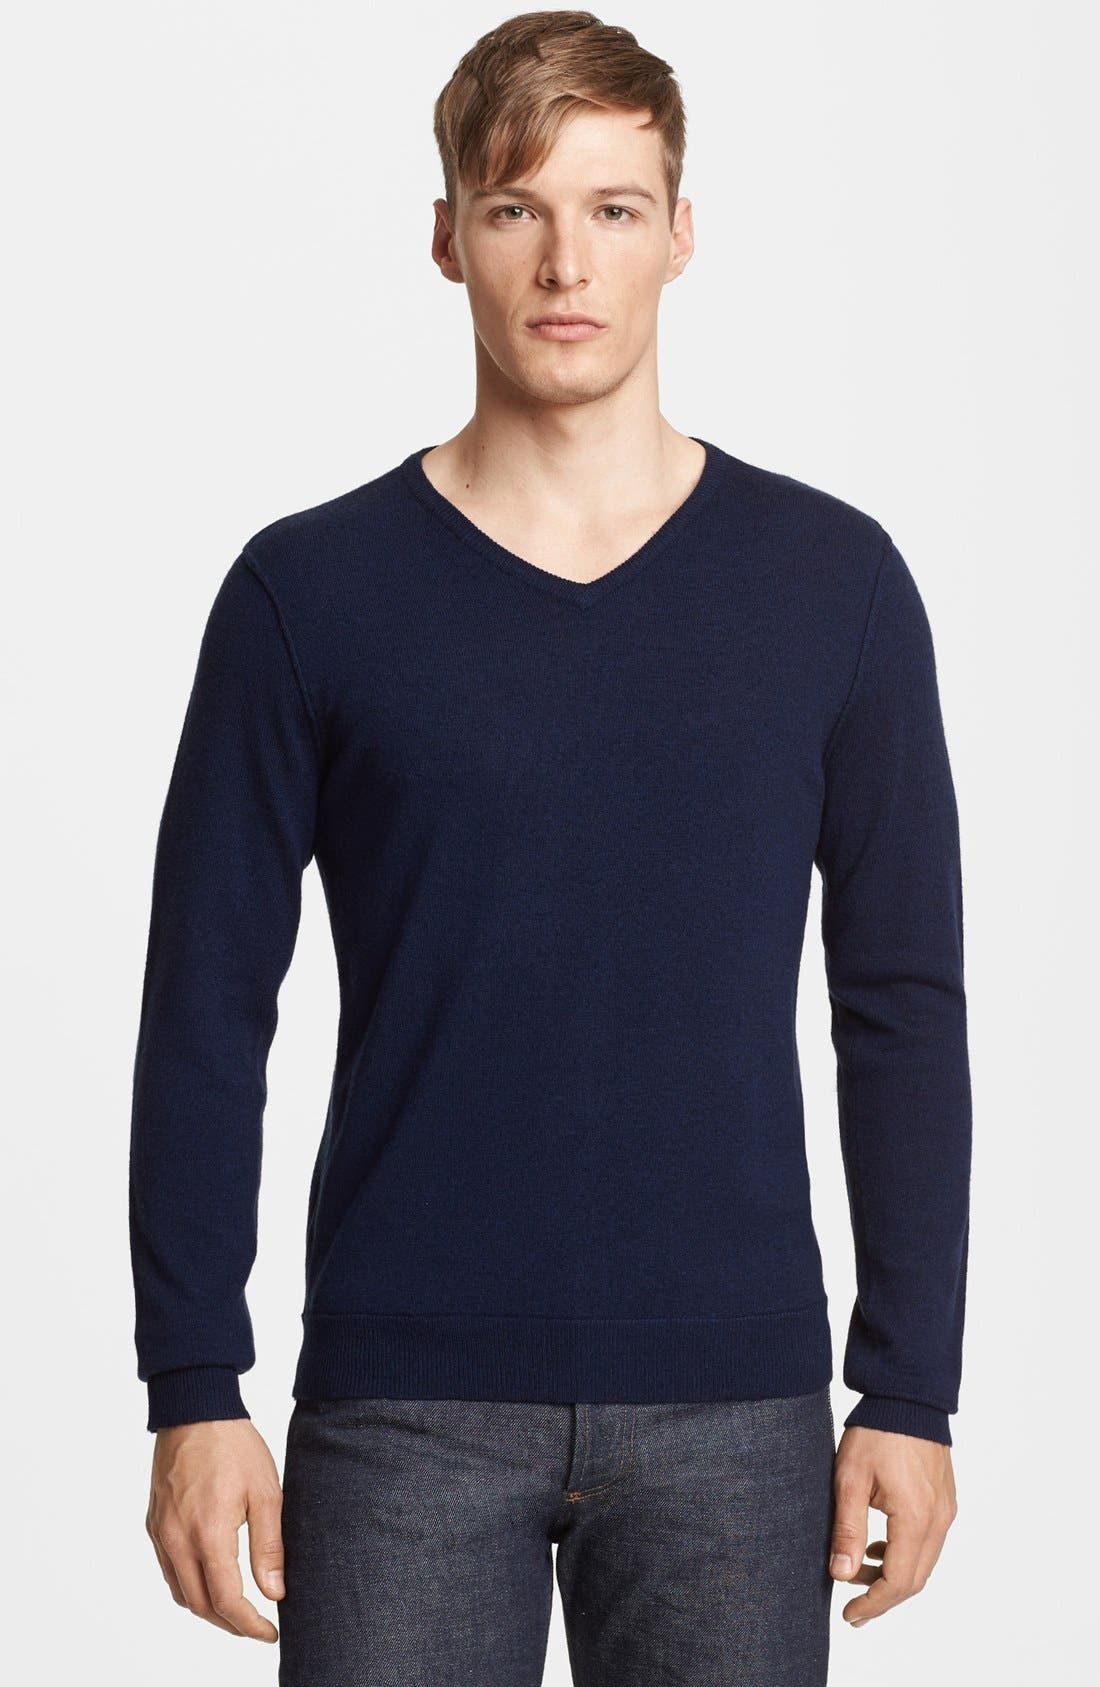 Main Image - rag & bone 'Abingdon' V-Neck Merino Wool Sweater